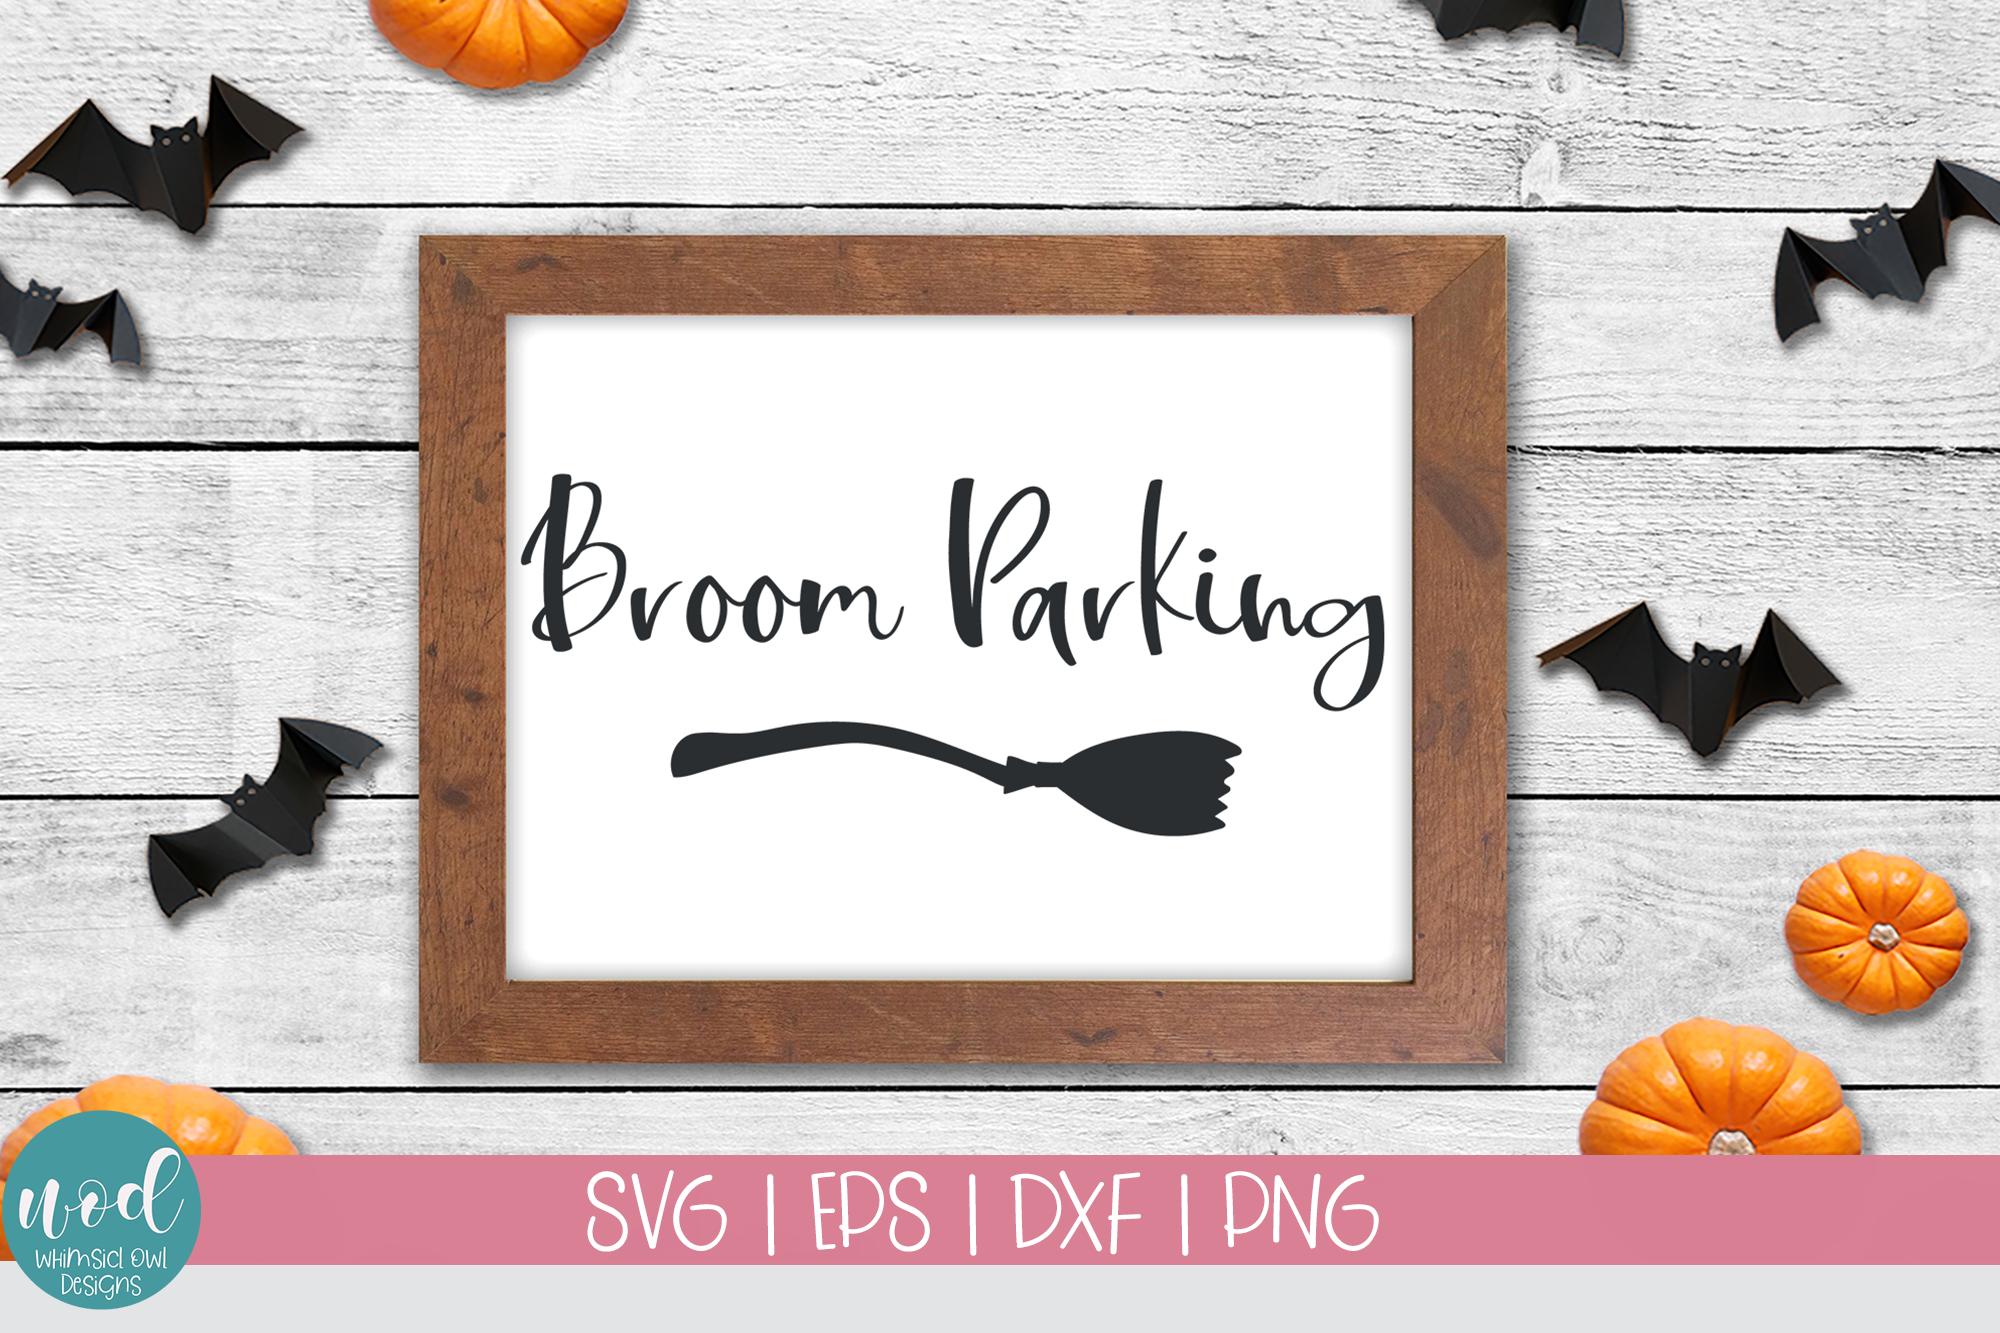 Broom Parking SVG File example image 3